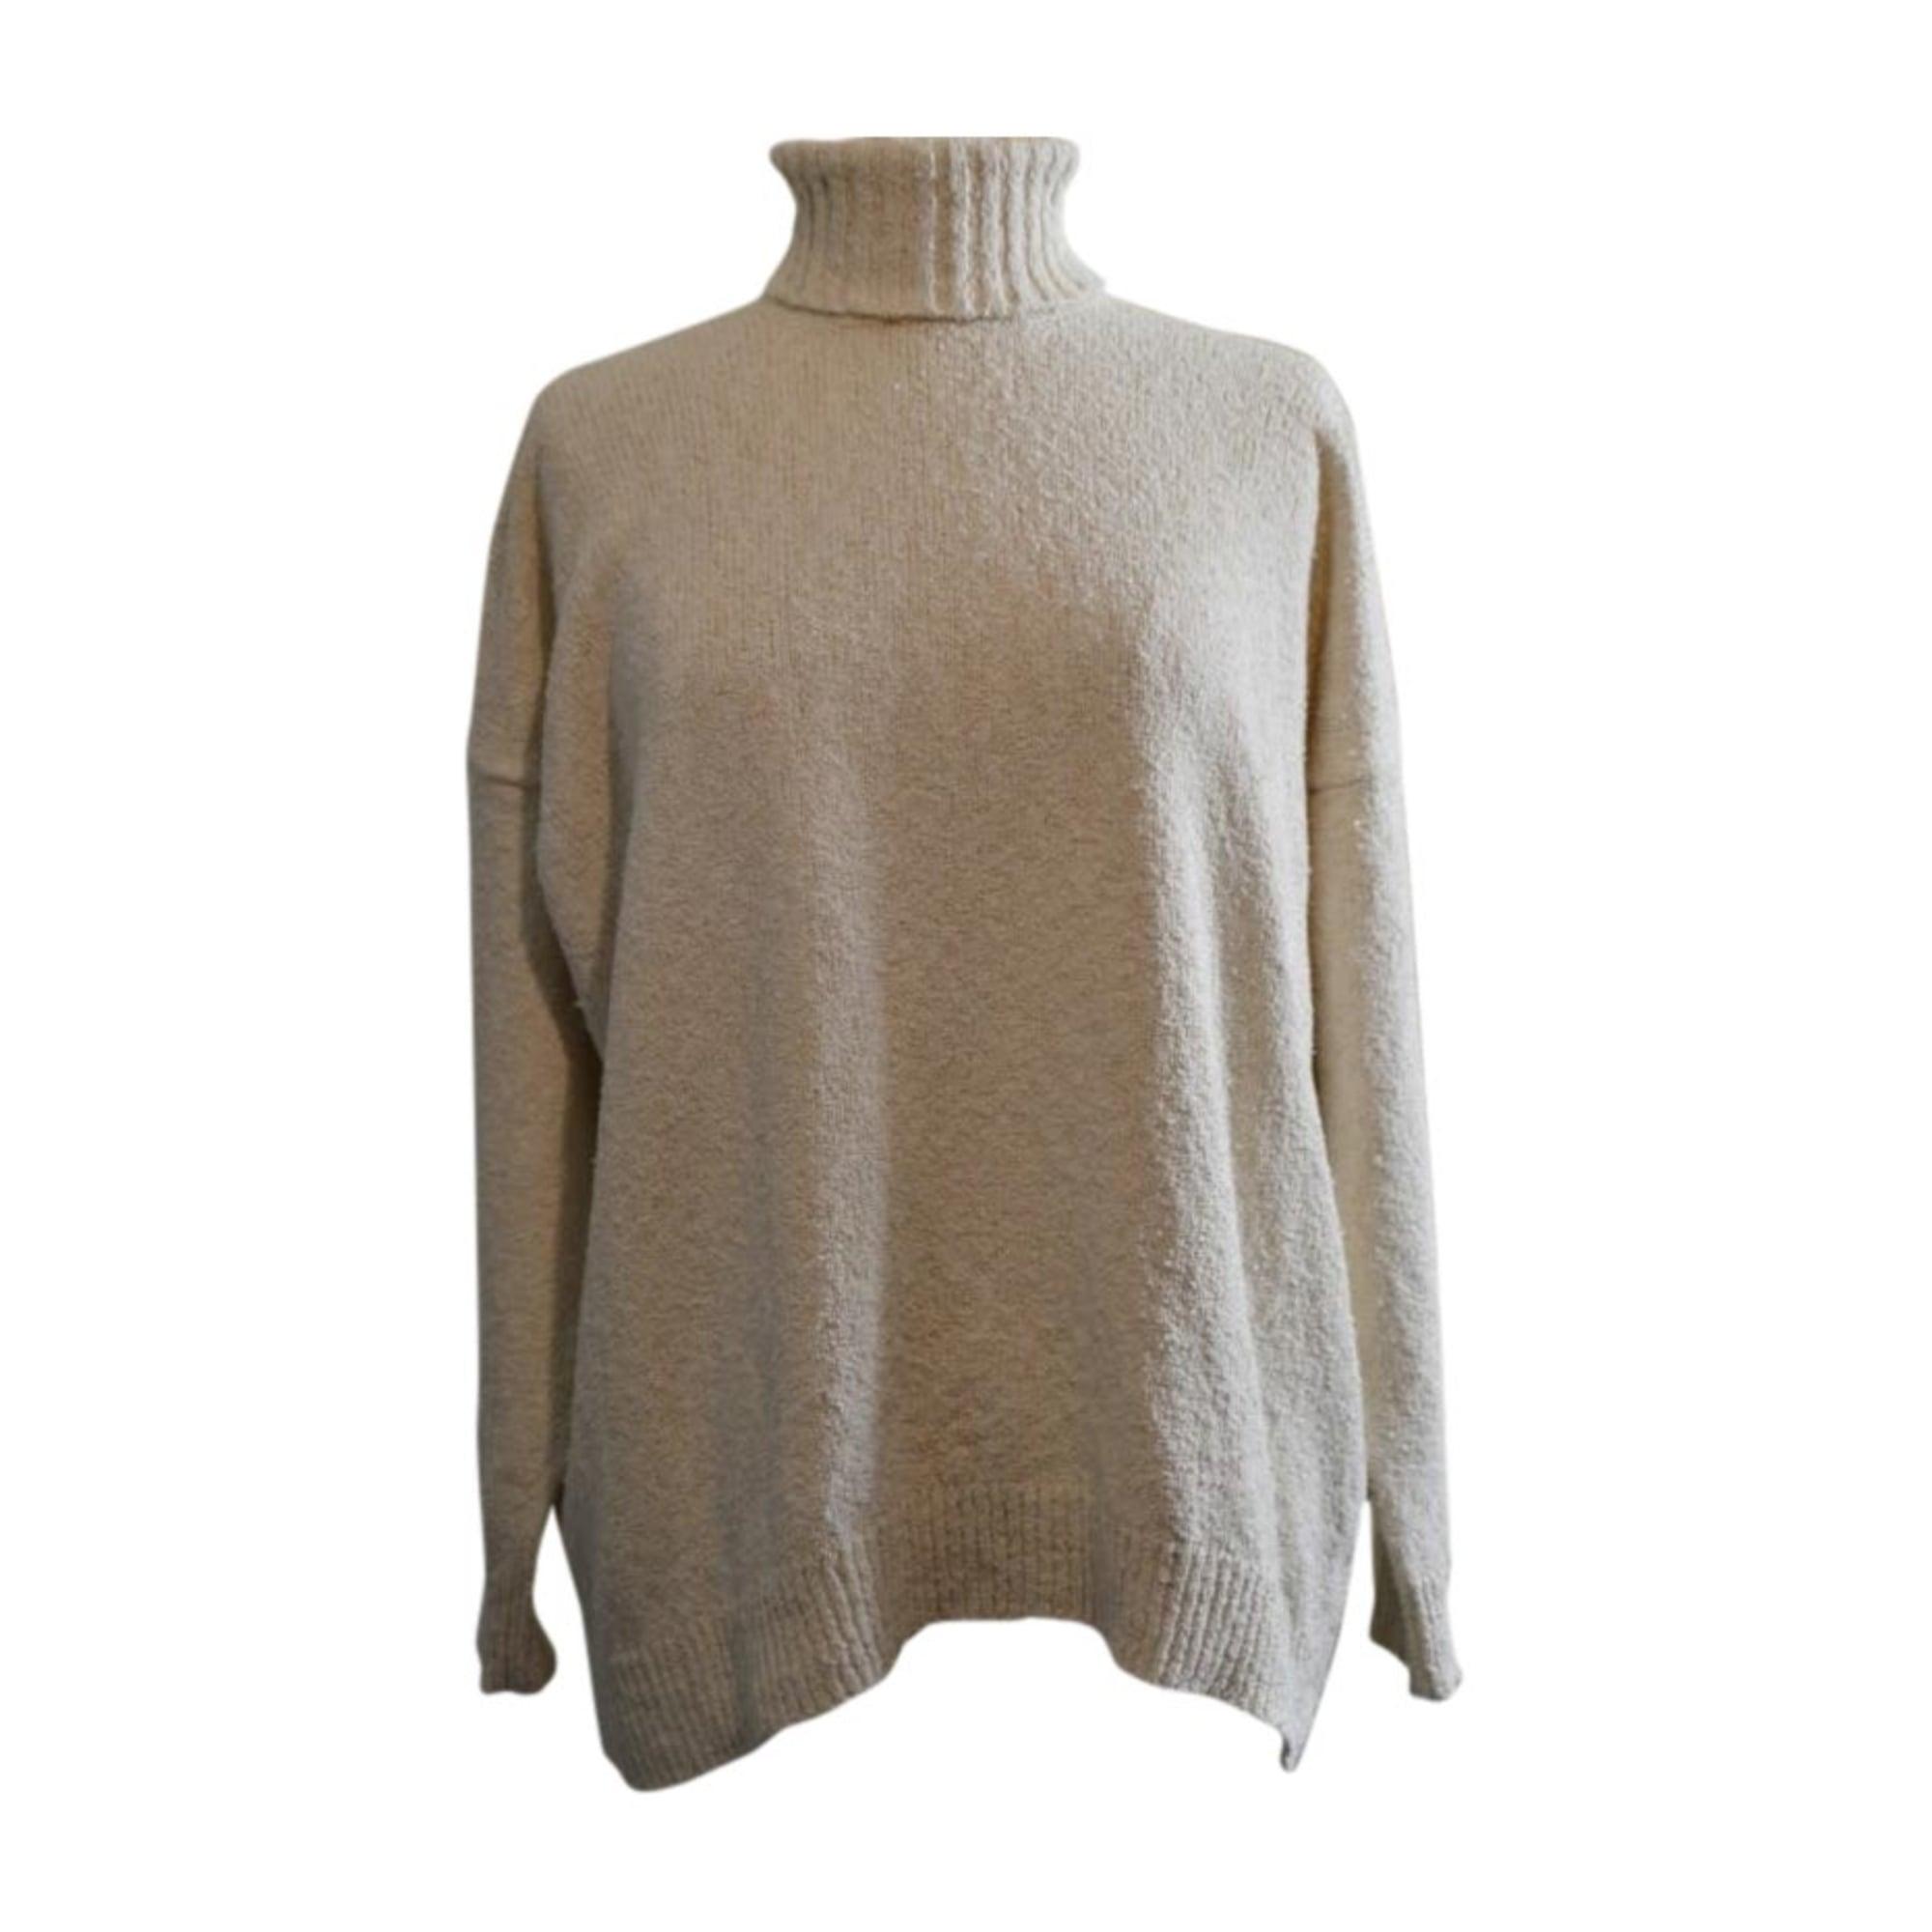 Maglione MICHAEL KORS Bianco, bianco sporco, ecru